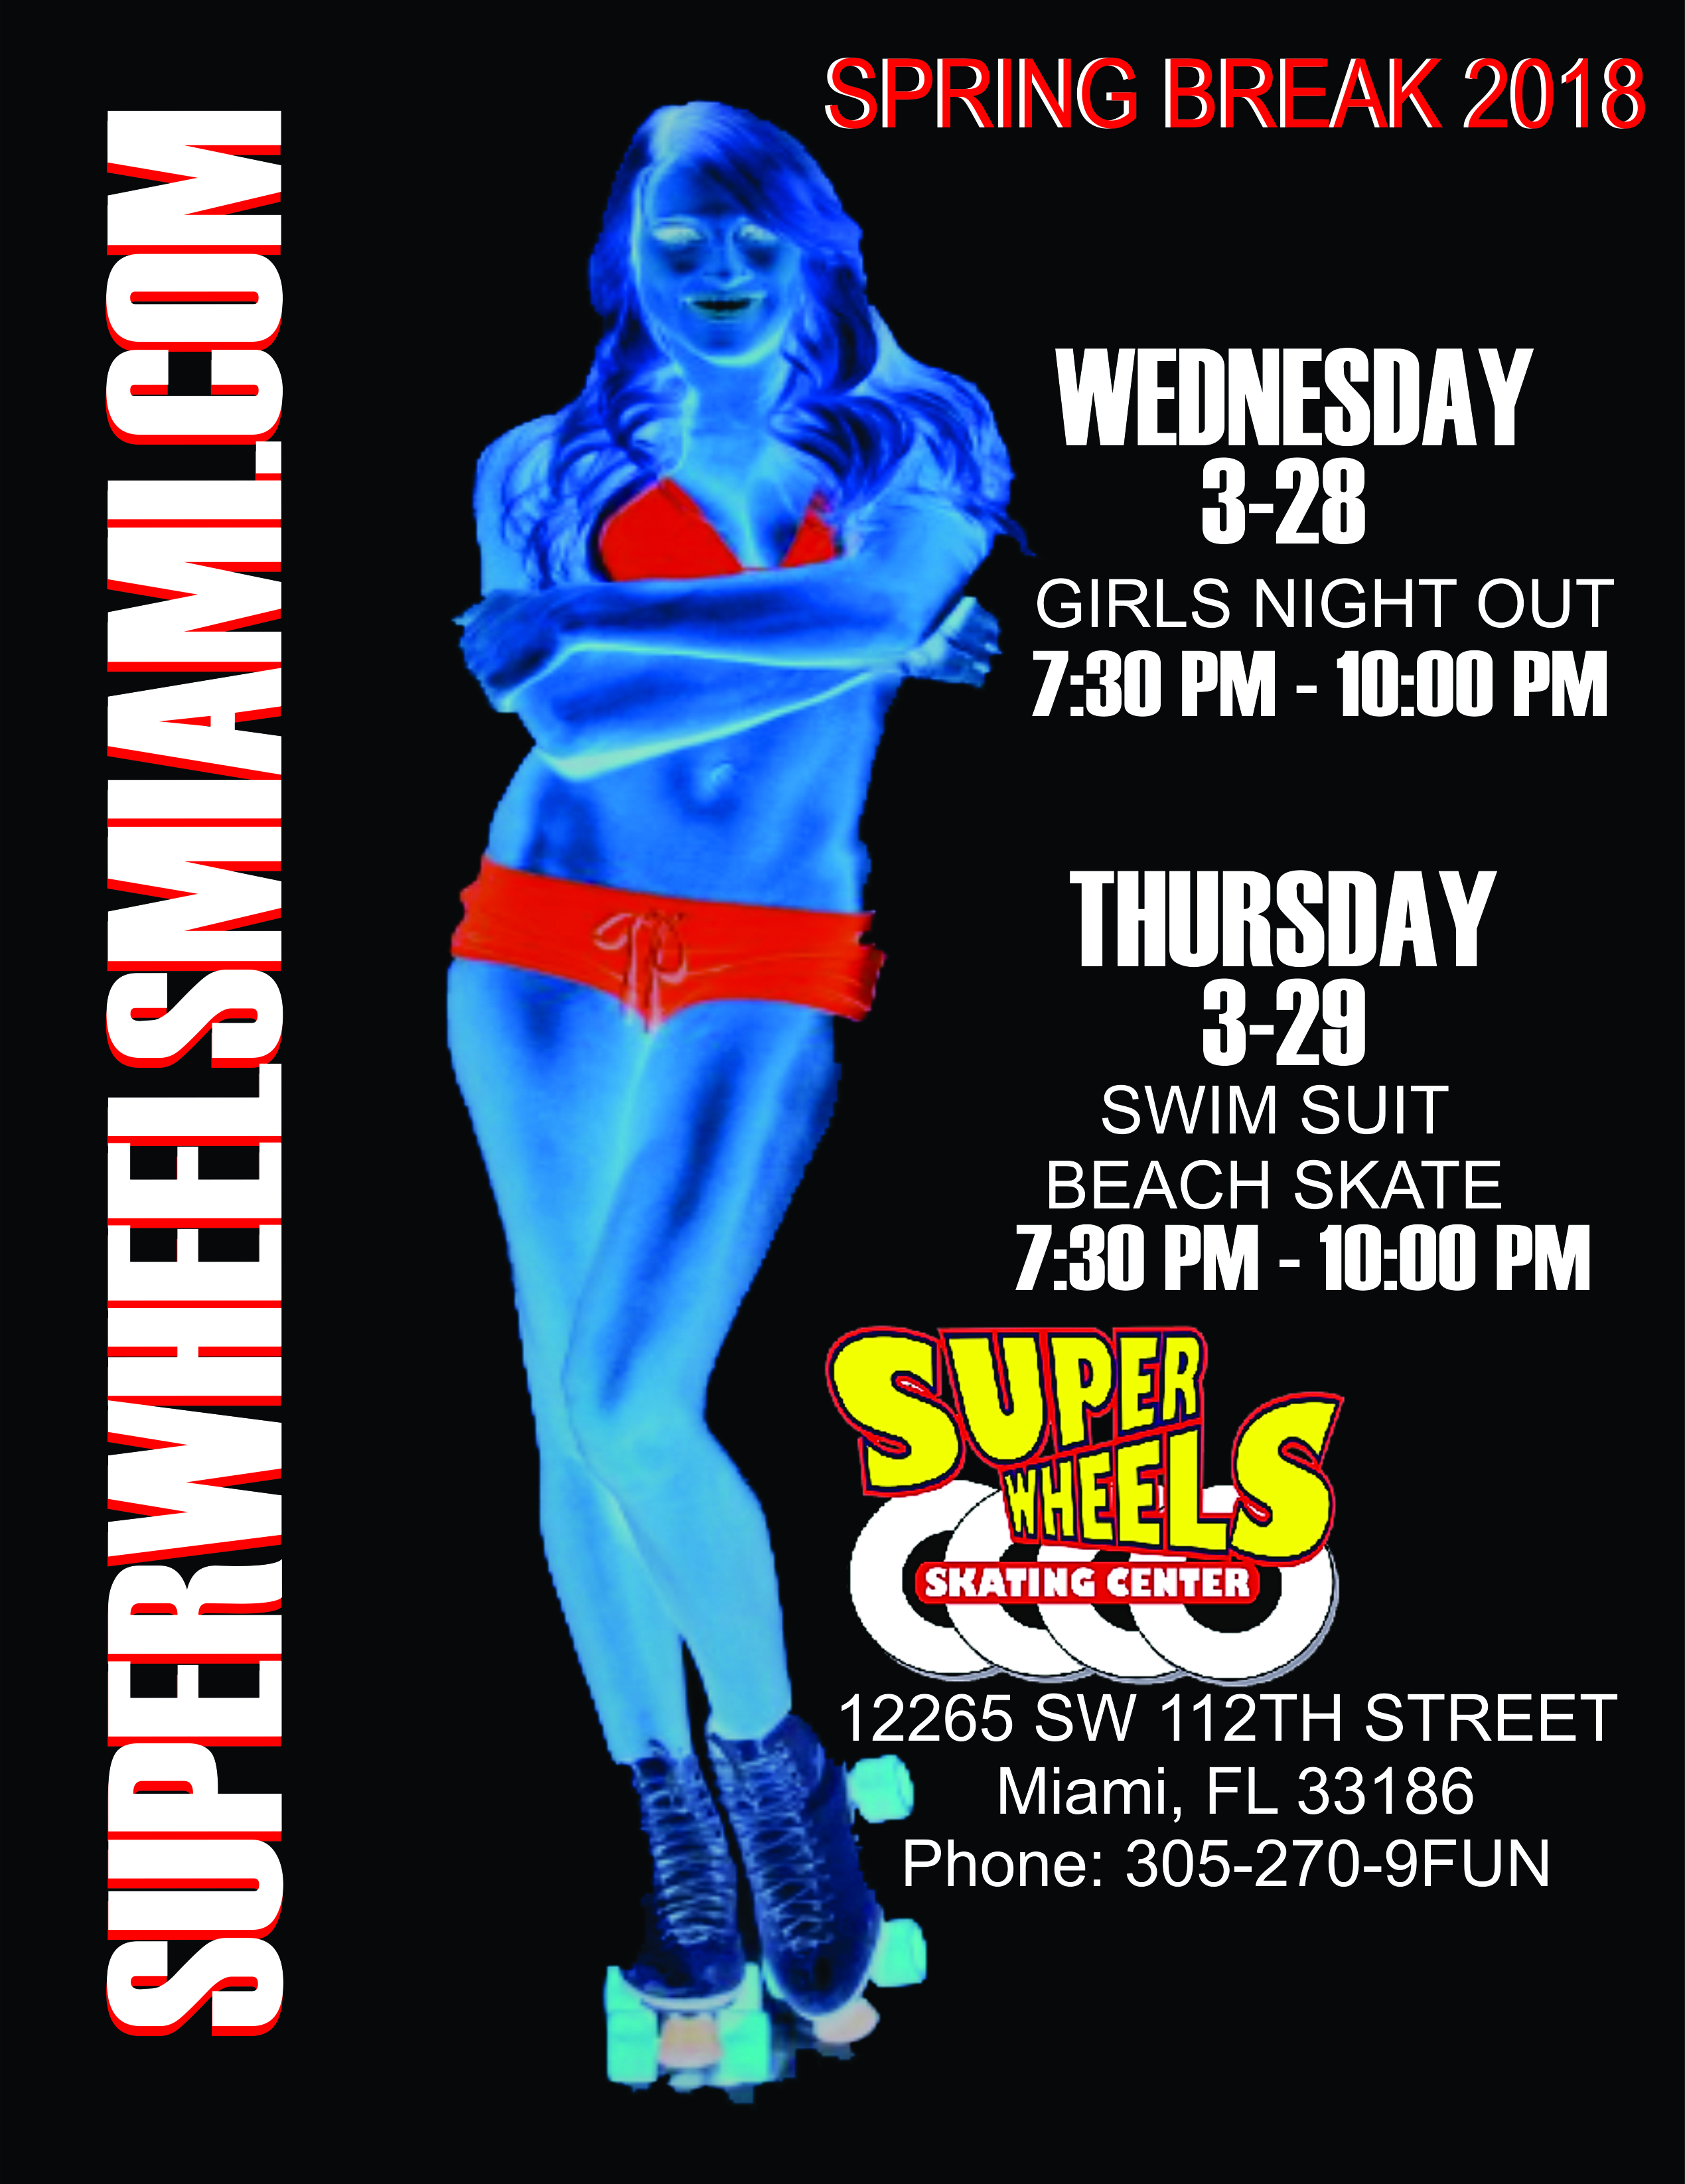 birthday party invitations – Super Wheels Miami